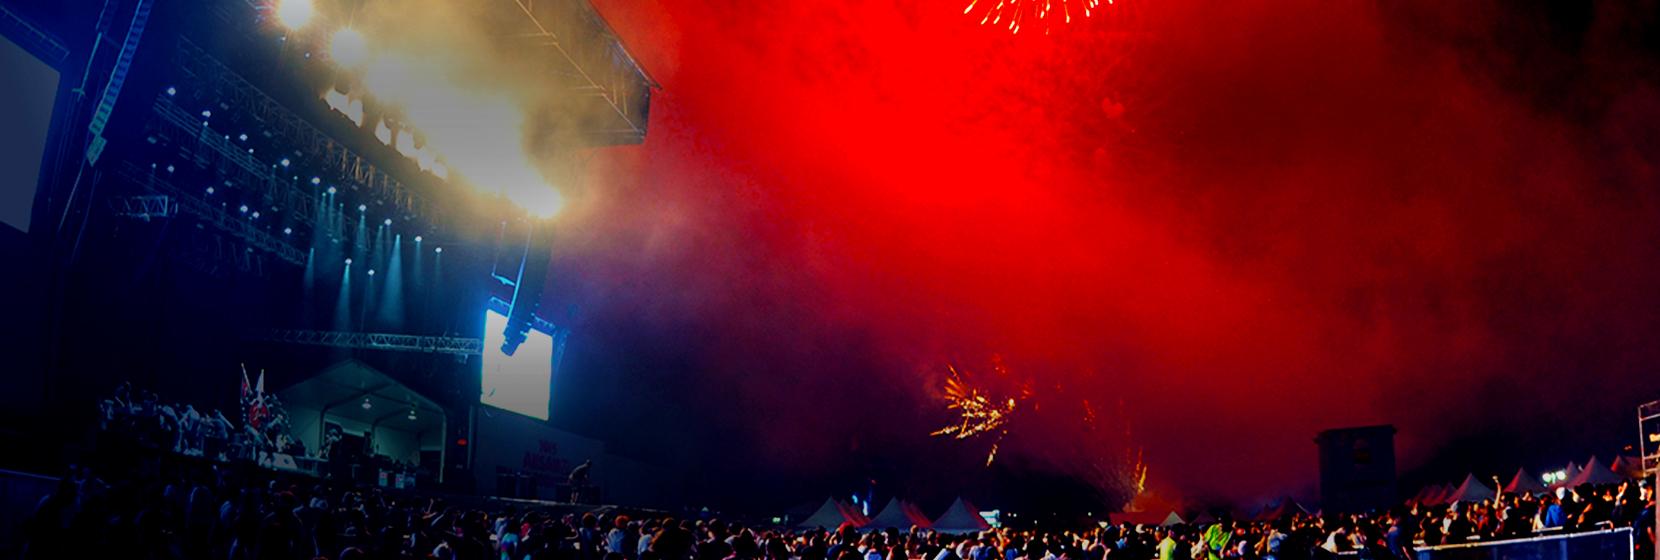 Jisan Valley Rock Music & Arts Festival image